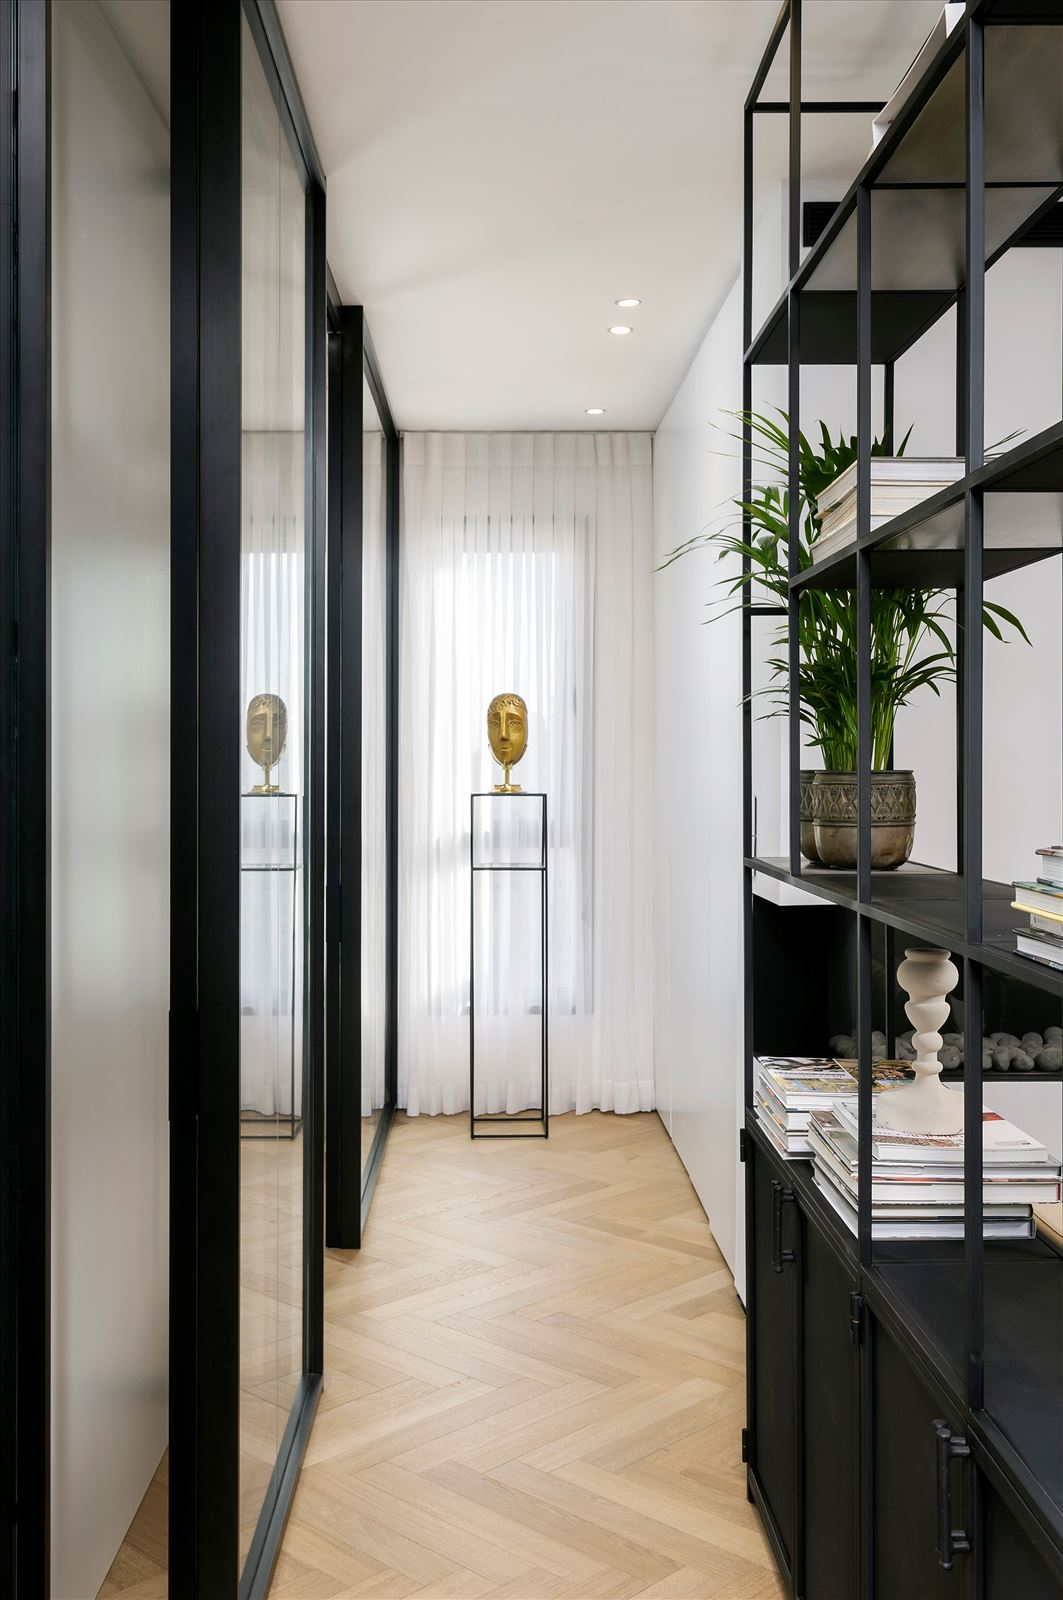 Penthouse - Petah Tikva מסדרון הדירה מואר בגופי תאורה מיוחדים בעיצובו של דורי קמחי